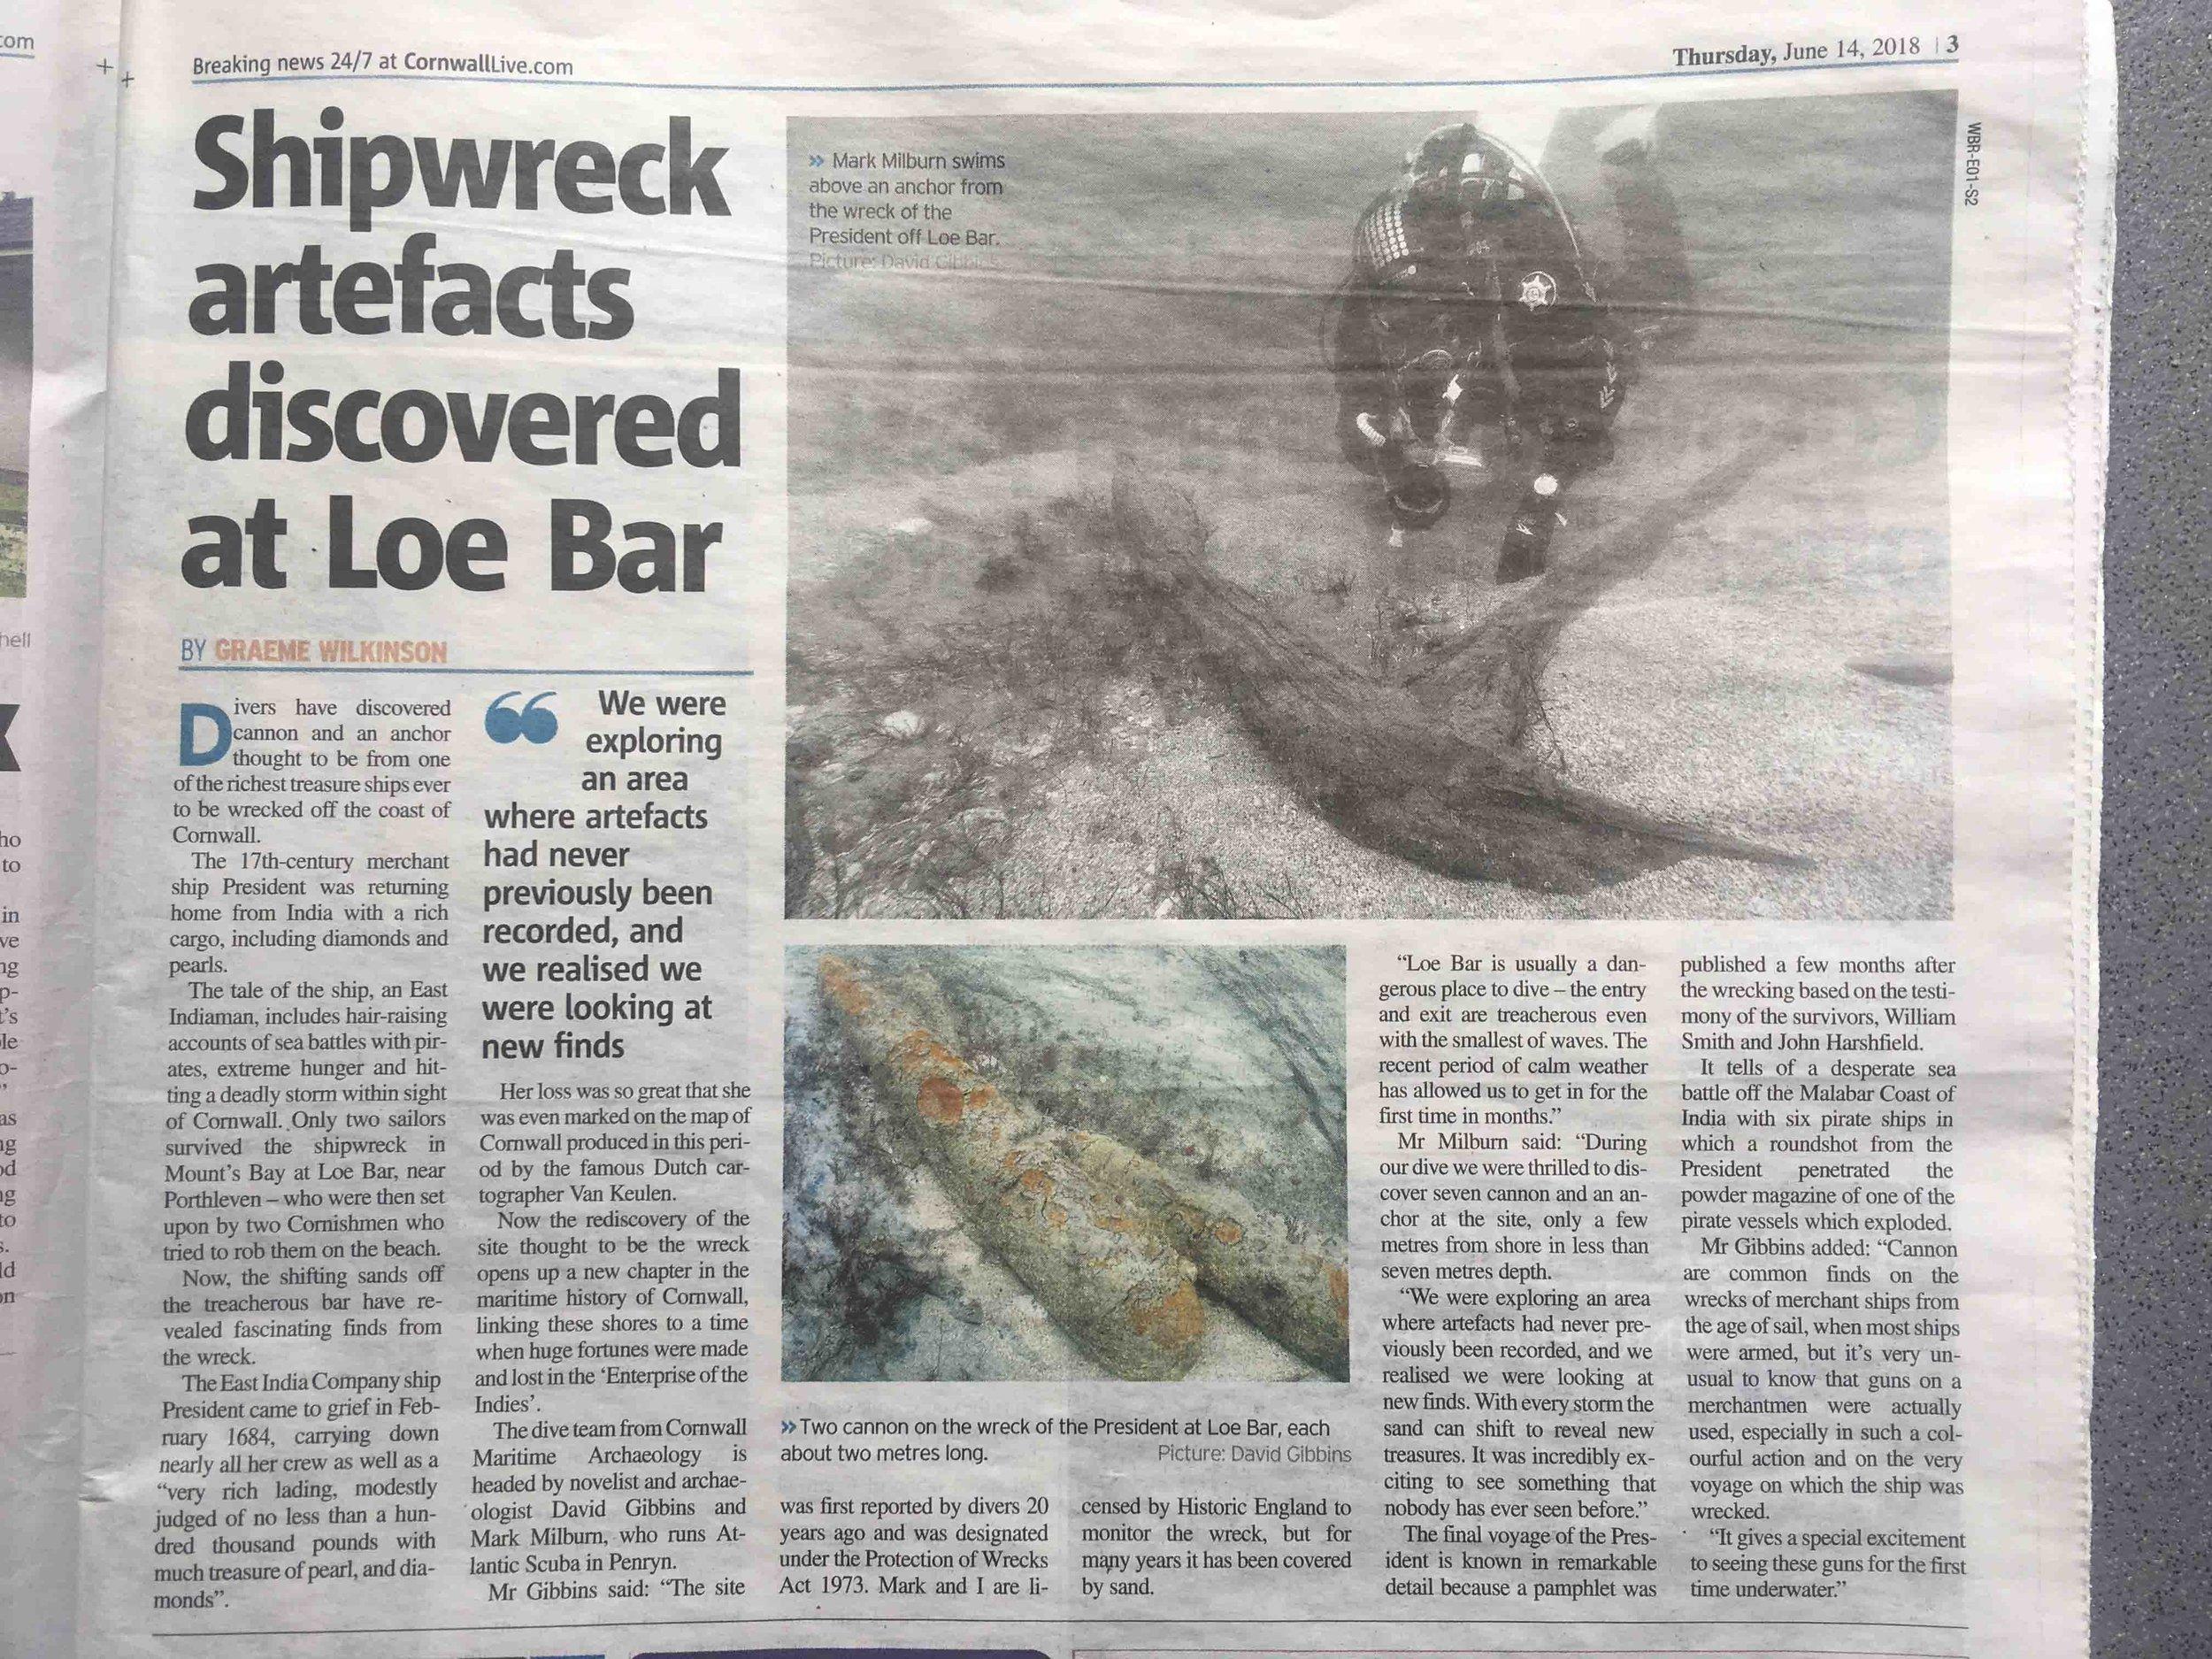 Loe Bar West Briton article 14 June 2018.jpg